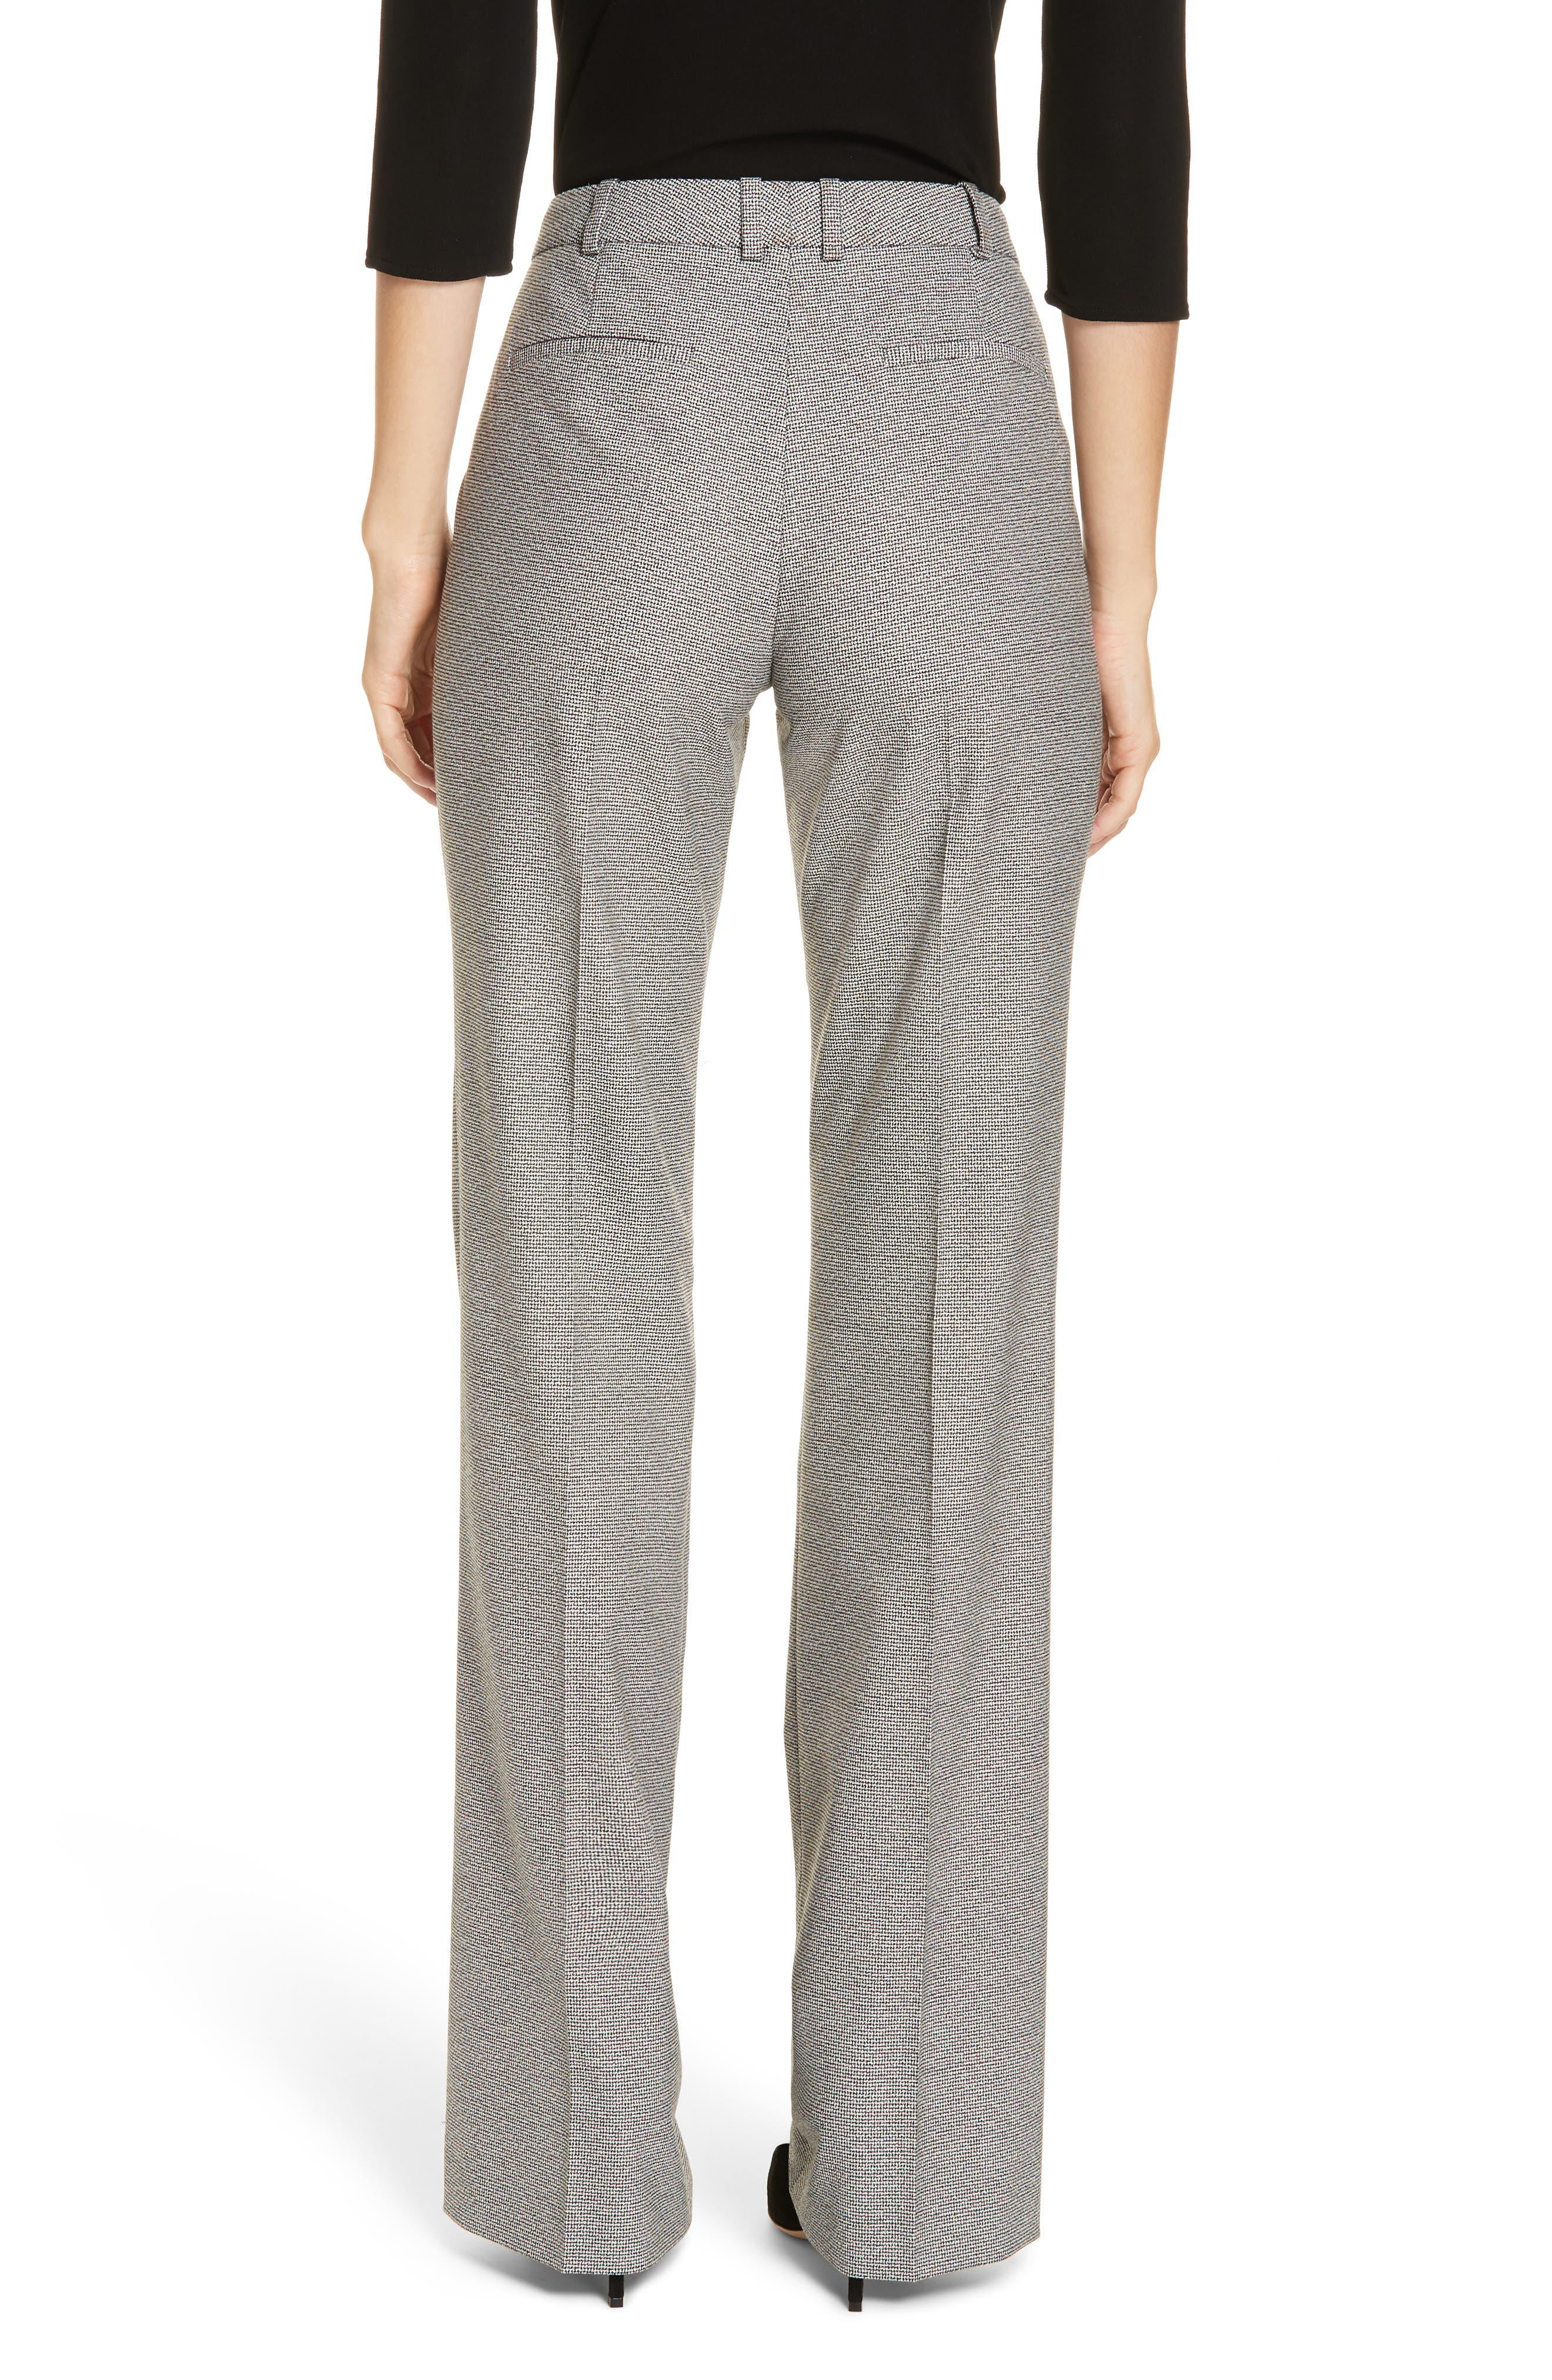 Tulea Blurred Optic Wool Suiting Trousers,                             Alternate thumbnail 2, color,                             BLACK FANTASY